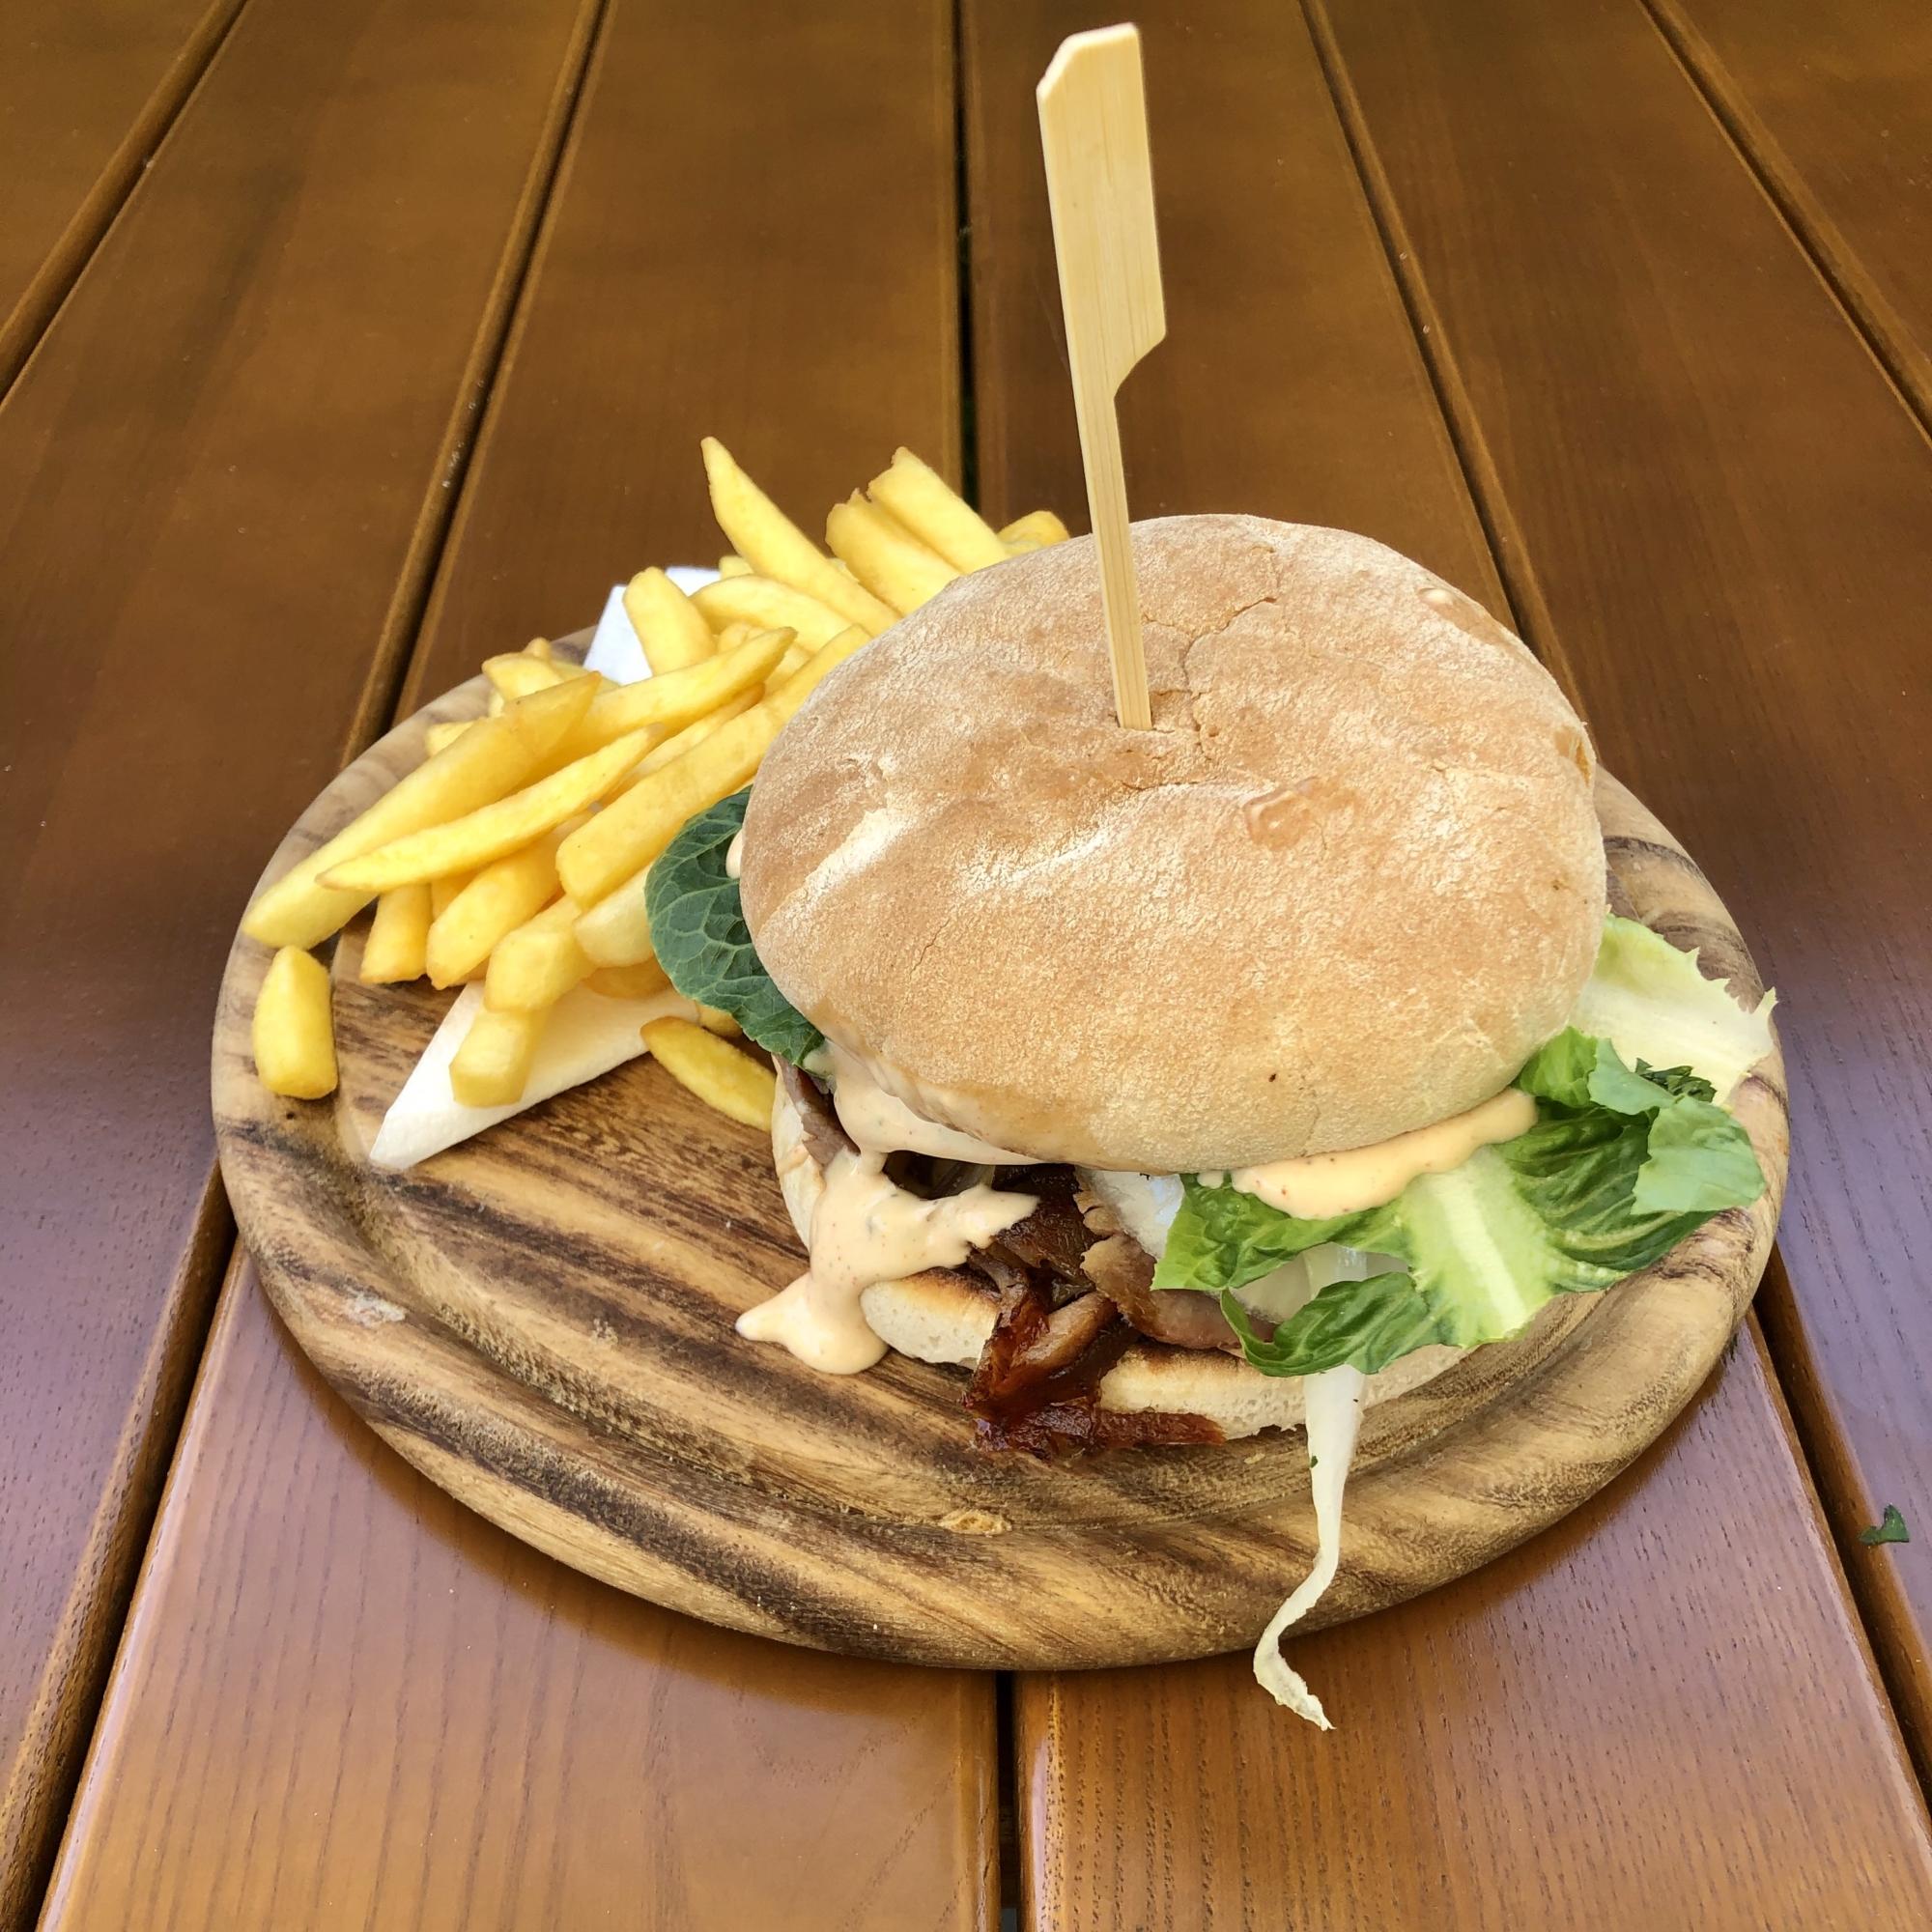 Grieche-Wedel-Taverna-Plaka-Gyros Burger